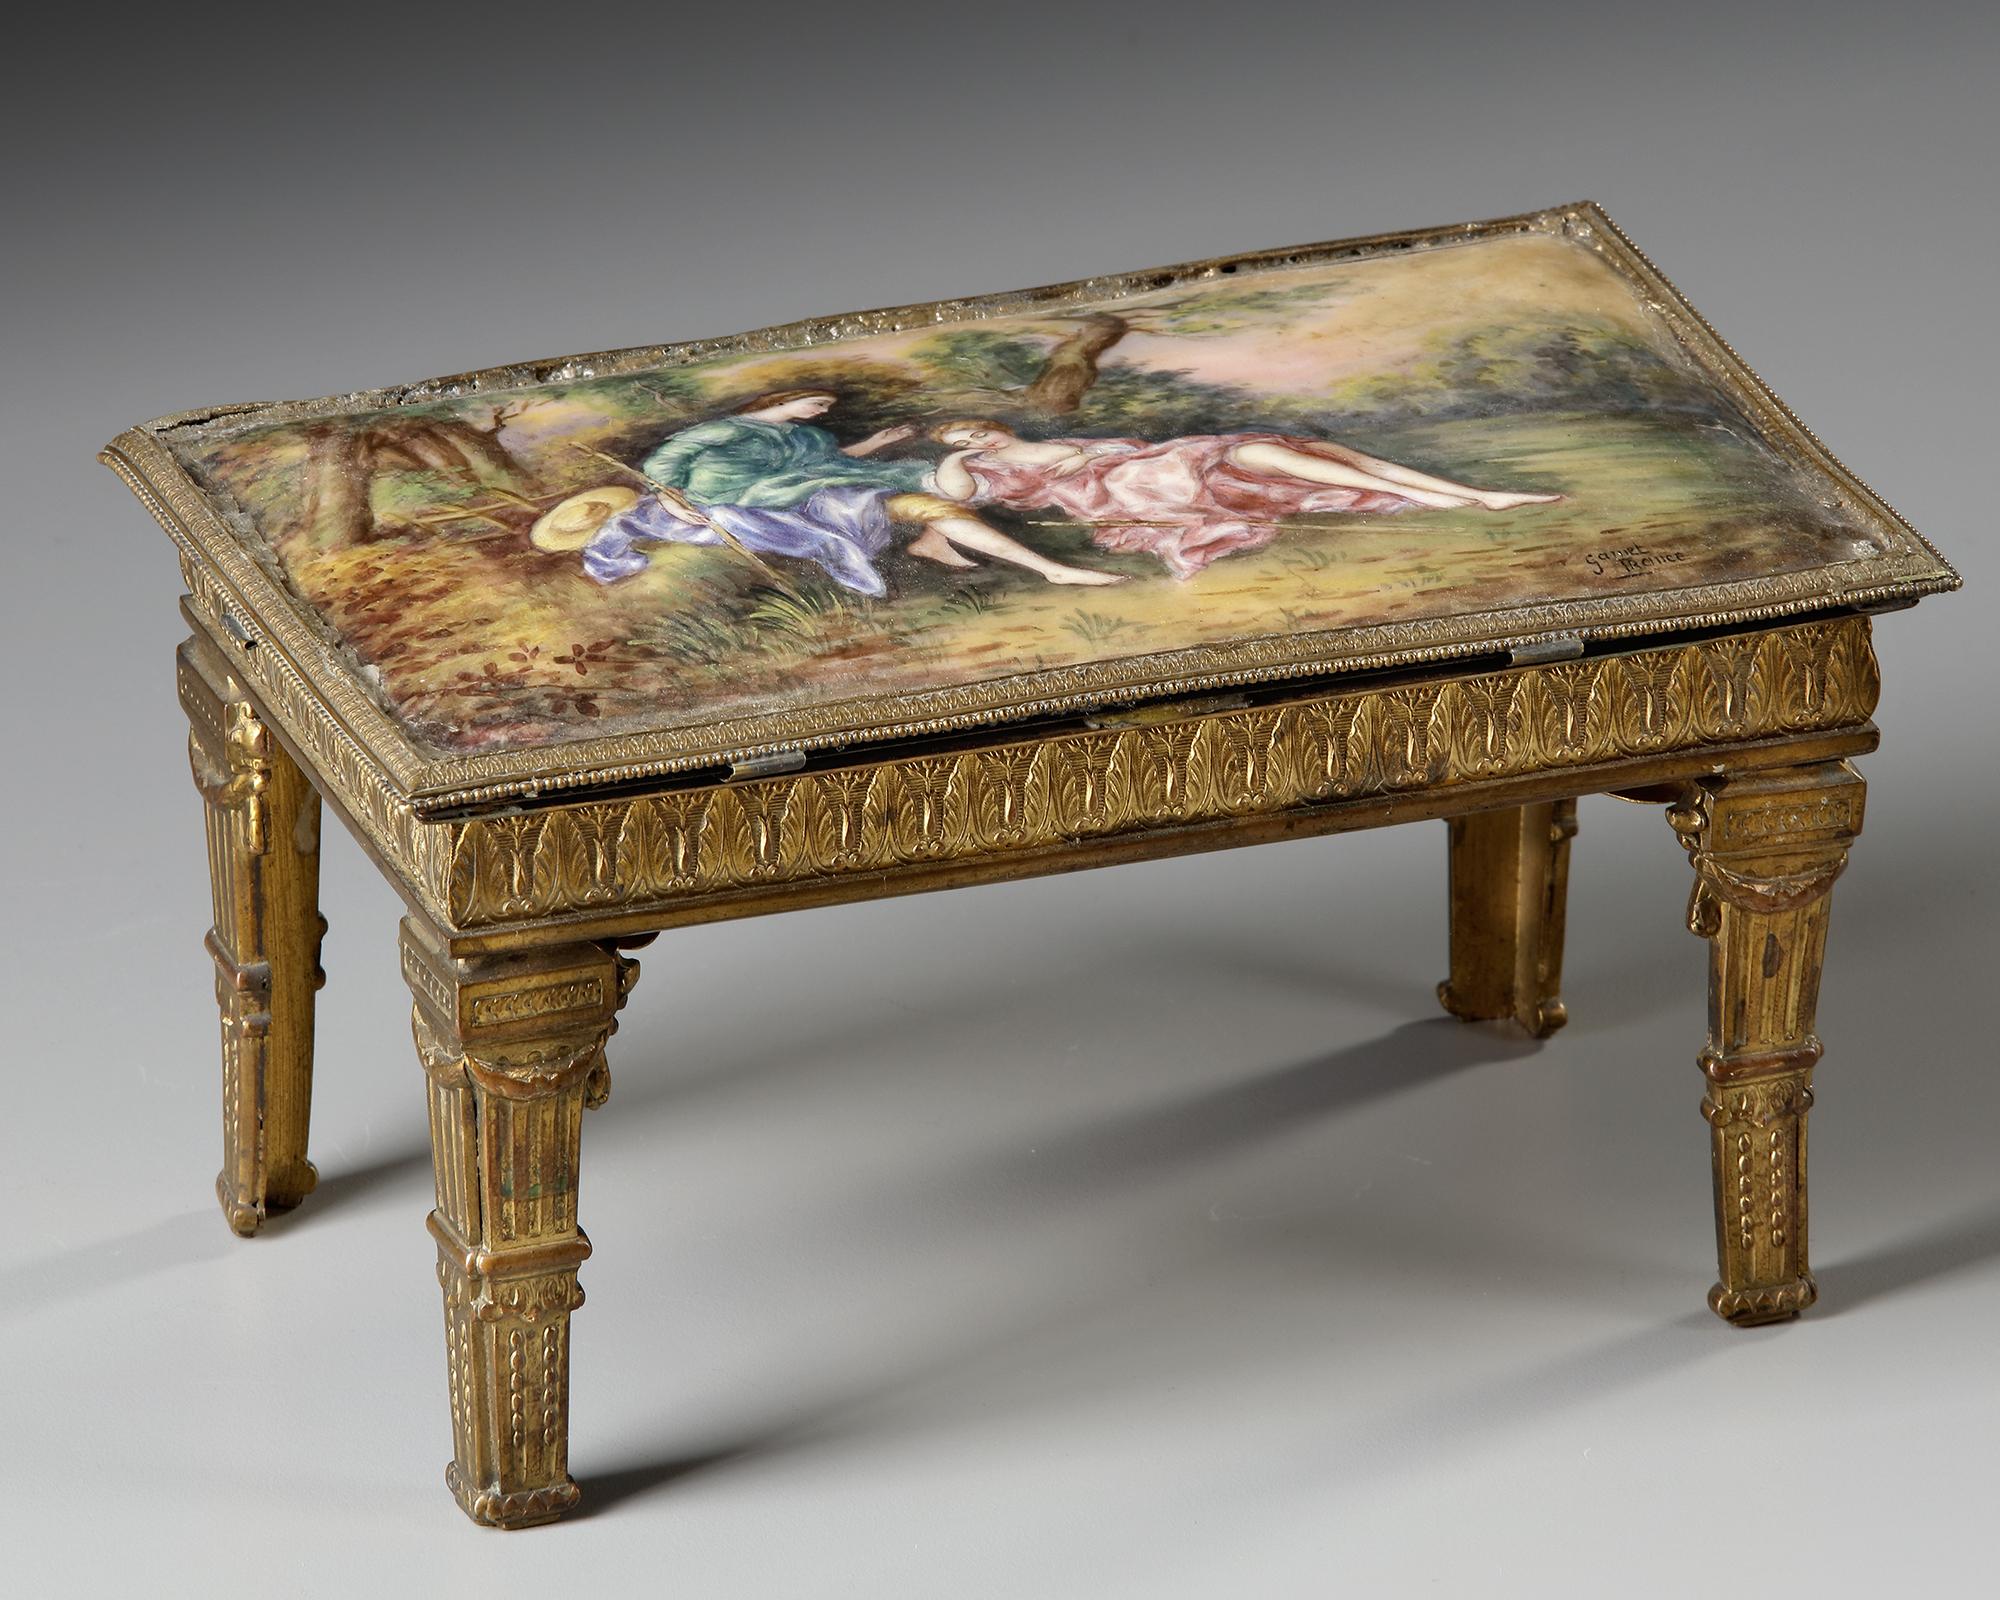 AN AUSTRIAN ENAMEL MINIATURE TABLE WITH PERFUME VIAL, LATE 19TH CENTURY